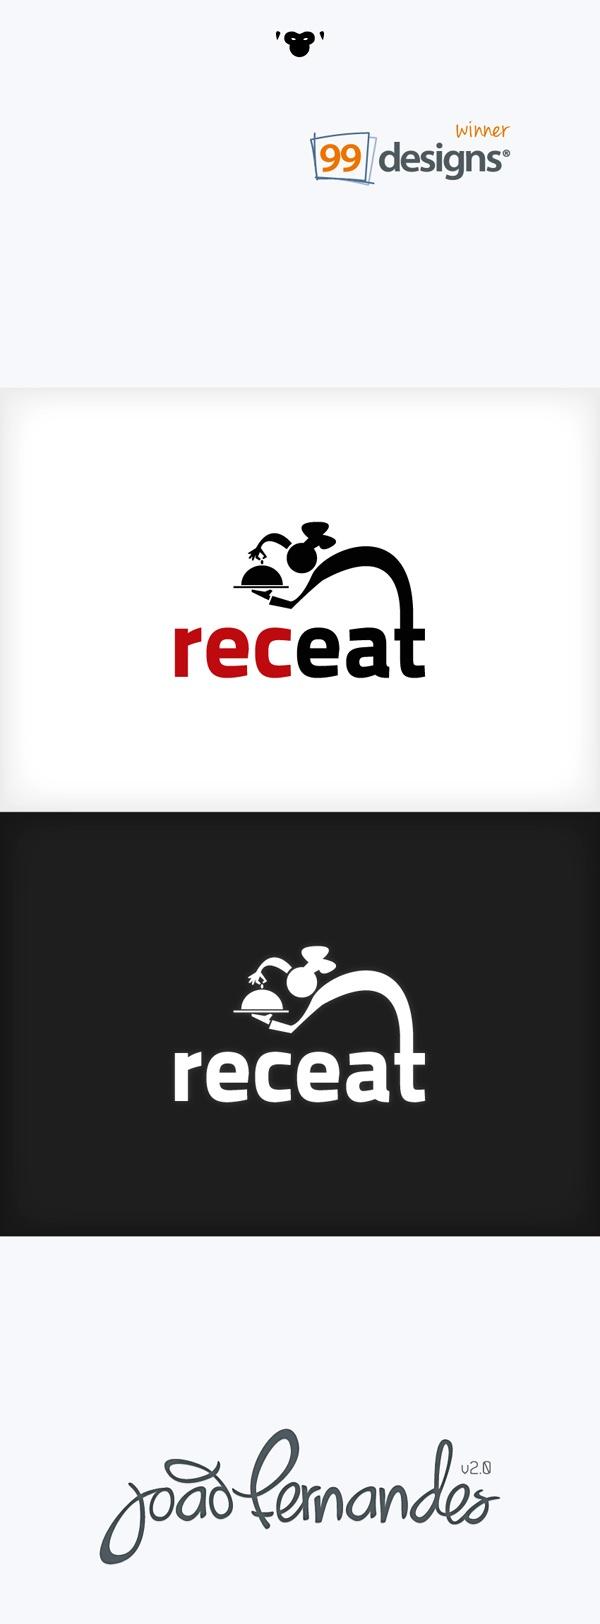 receat | Australia by João Fernandes, via Behance